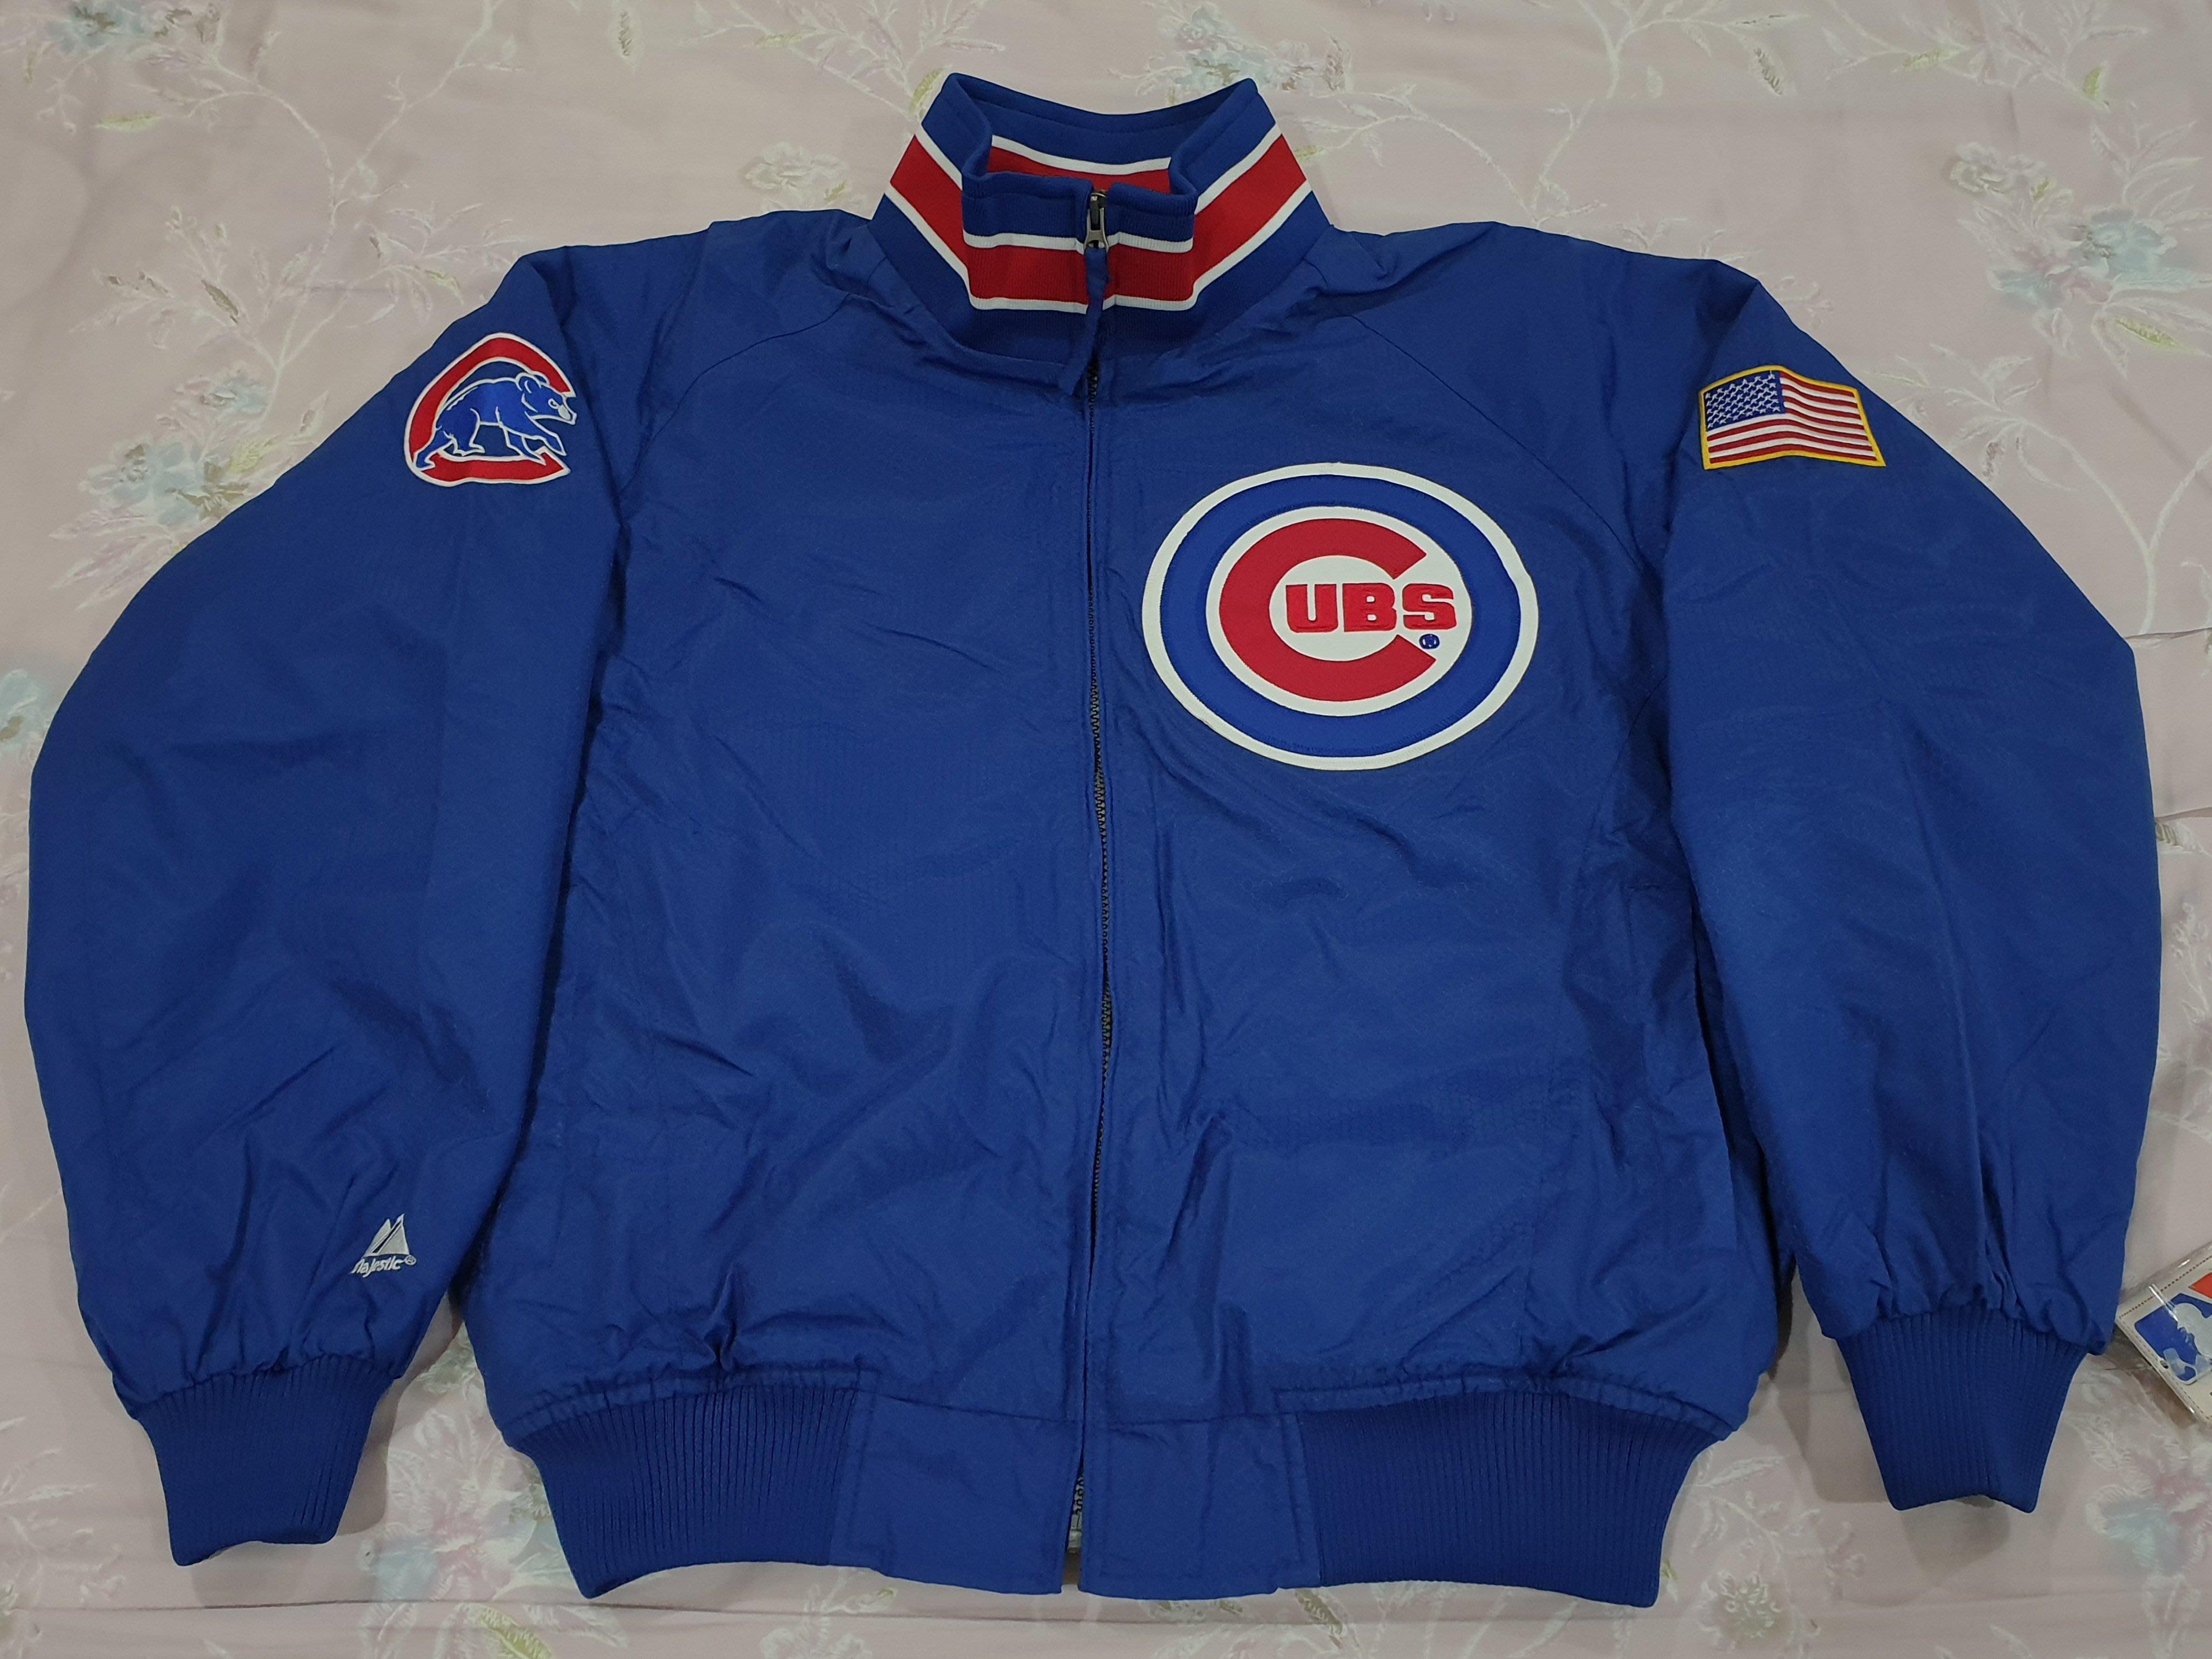 MLB Majestic Chicago Cubs 大聯盟 芝加哥 小熊隊 球員版 實戰 棒球 外套